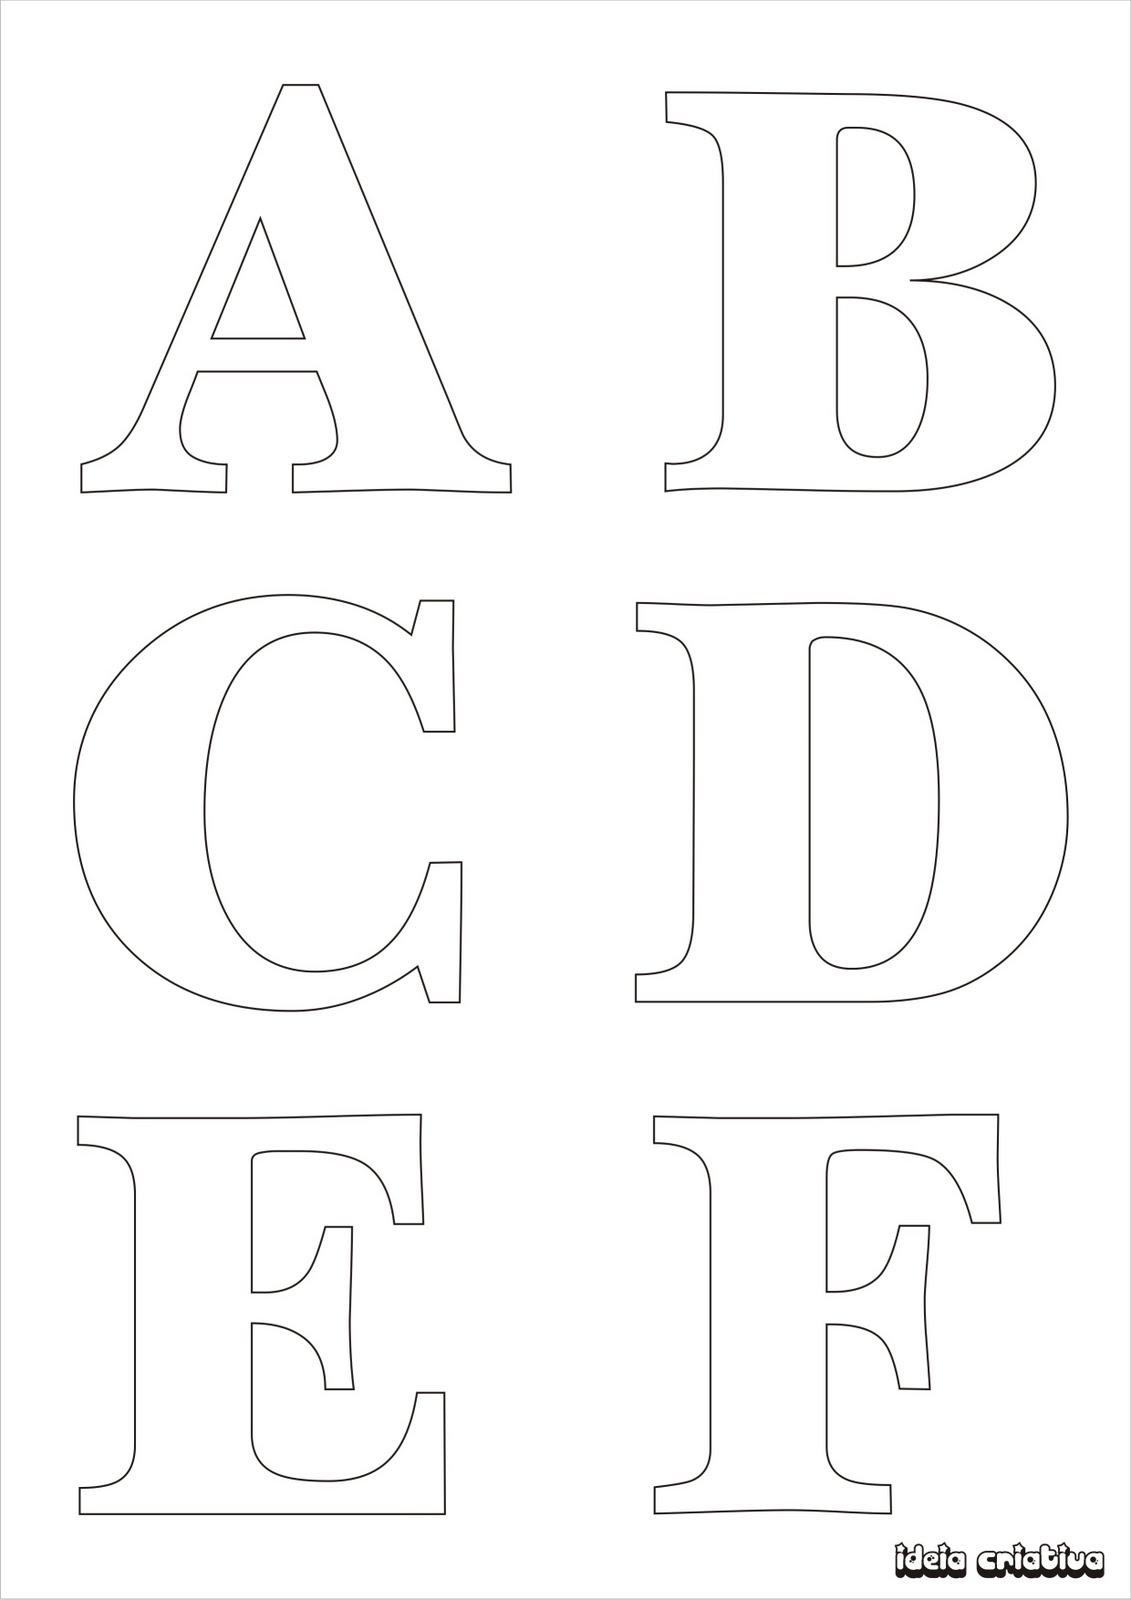 ... por gi barbosa marcadores alfabetos para imprimir moldes diversos